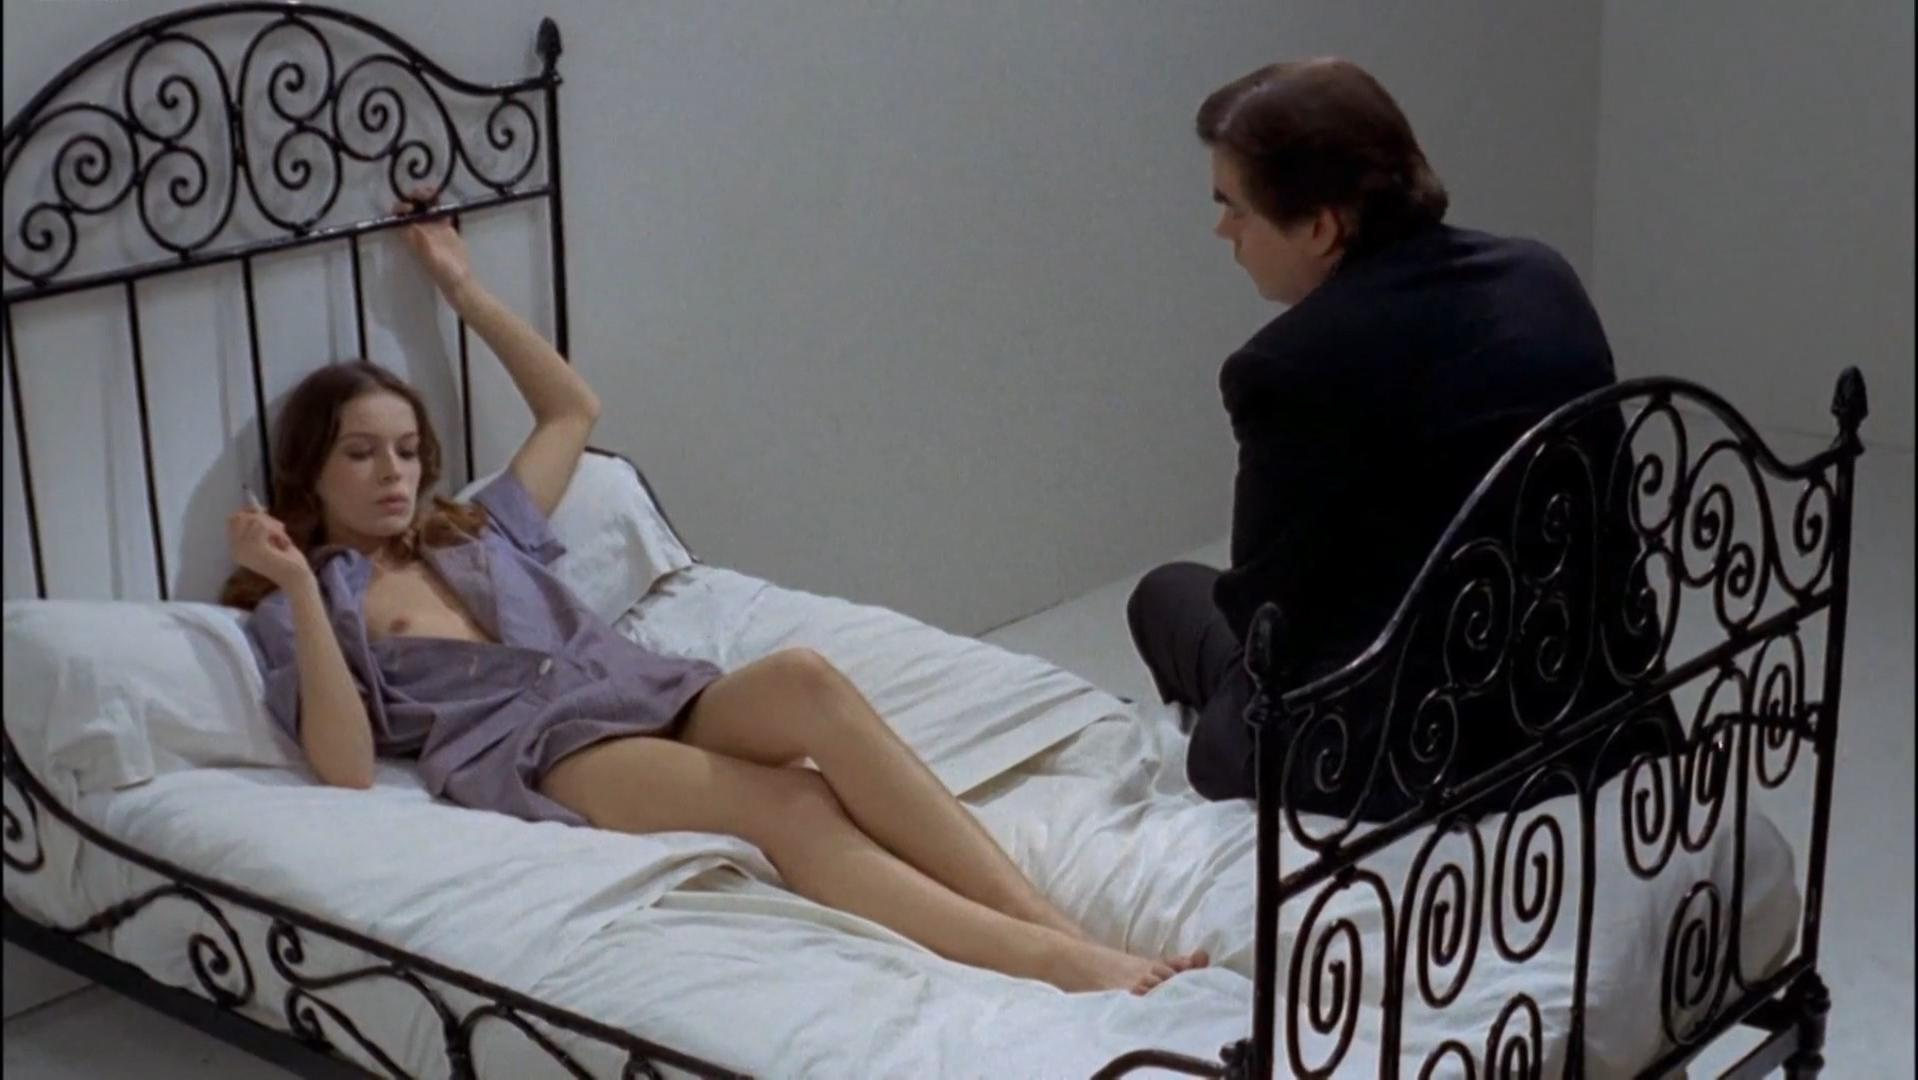 Anicee Alvina nude - Glissements progressifs du plaisir (1973)